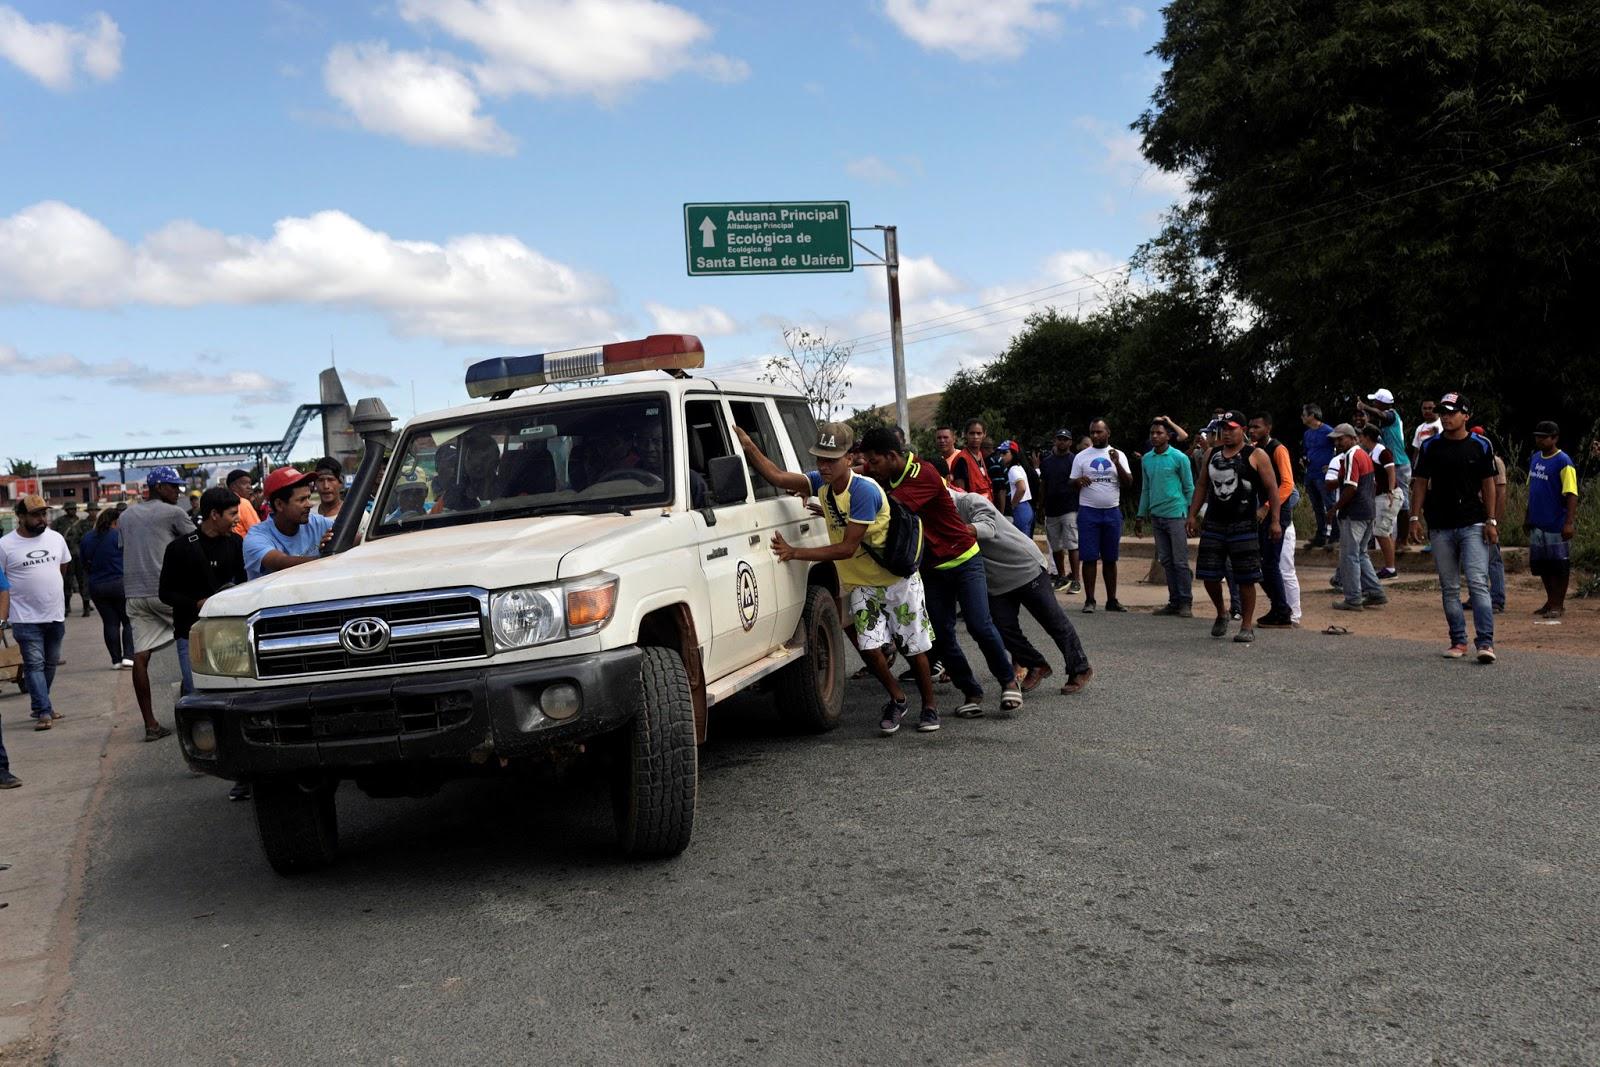 Ambulance at the border between Brazil and Venezuela. Photo:  Ricardo Moraes/Reuters